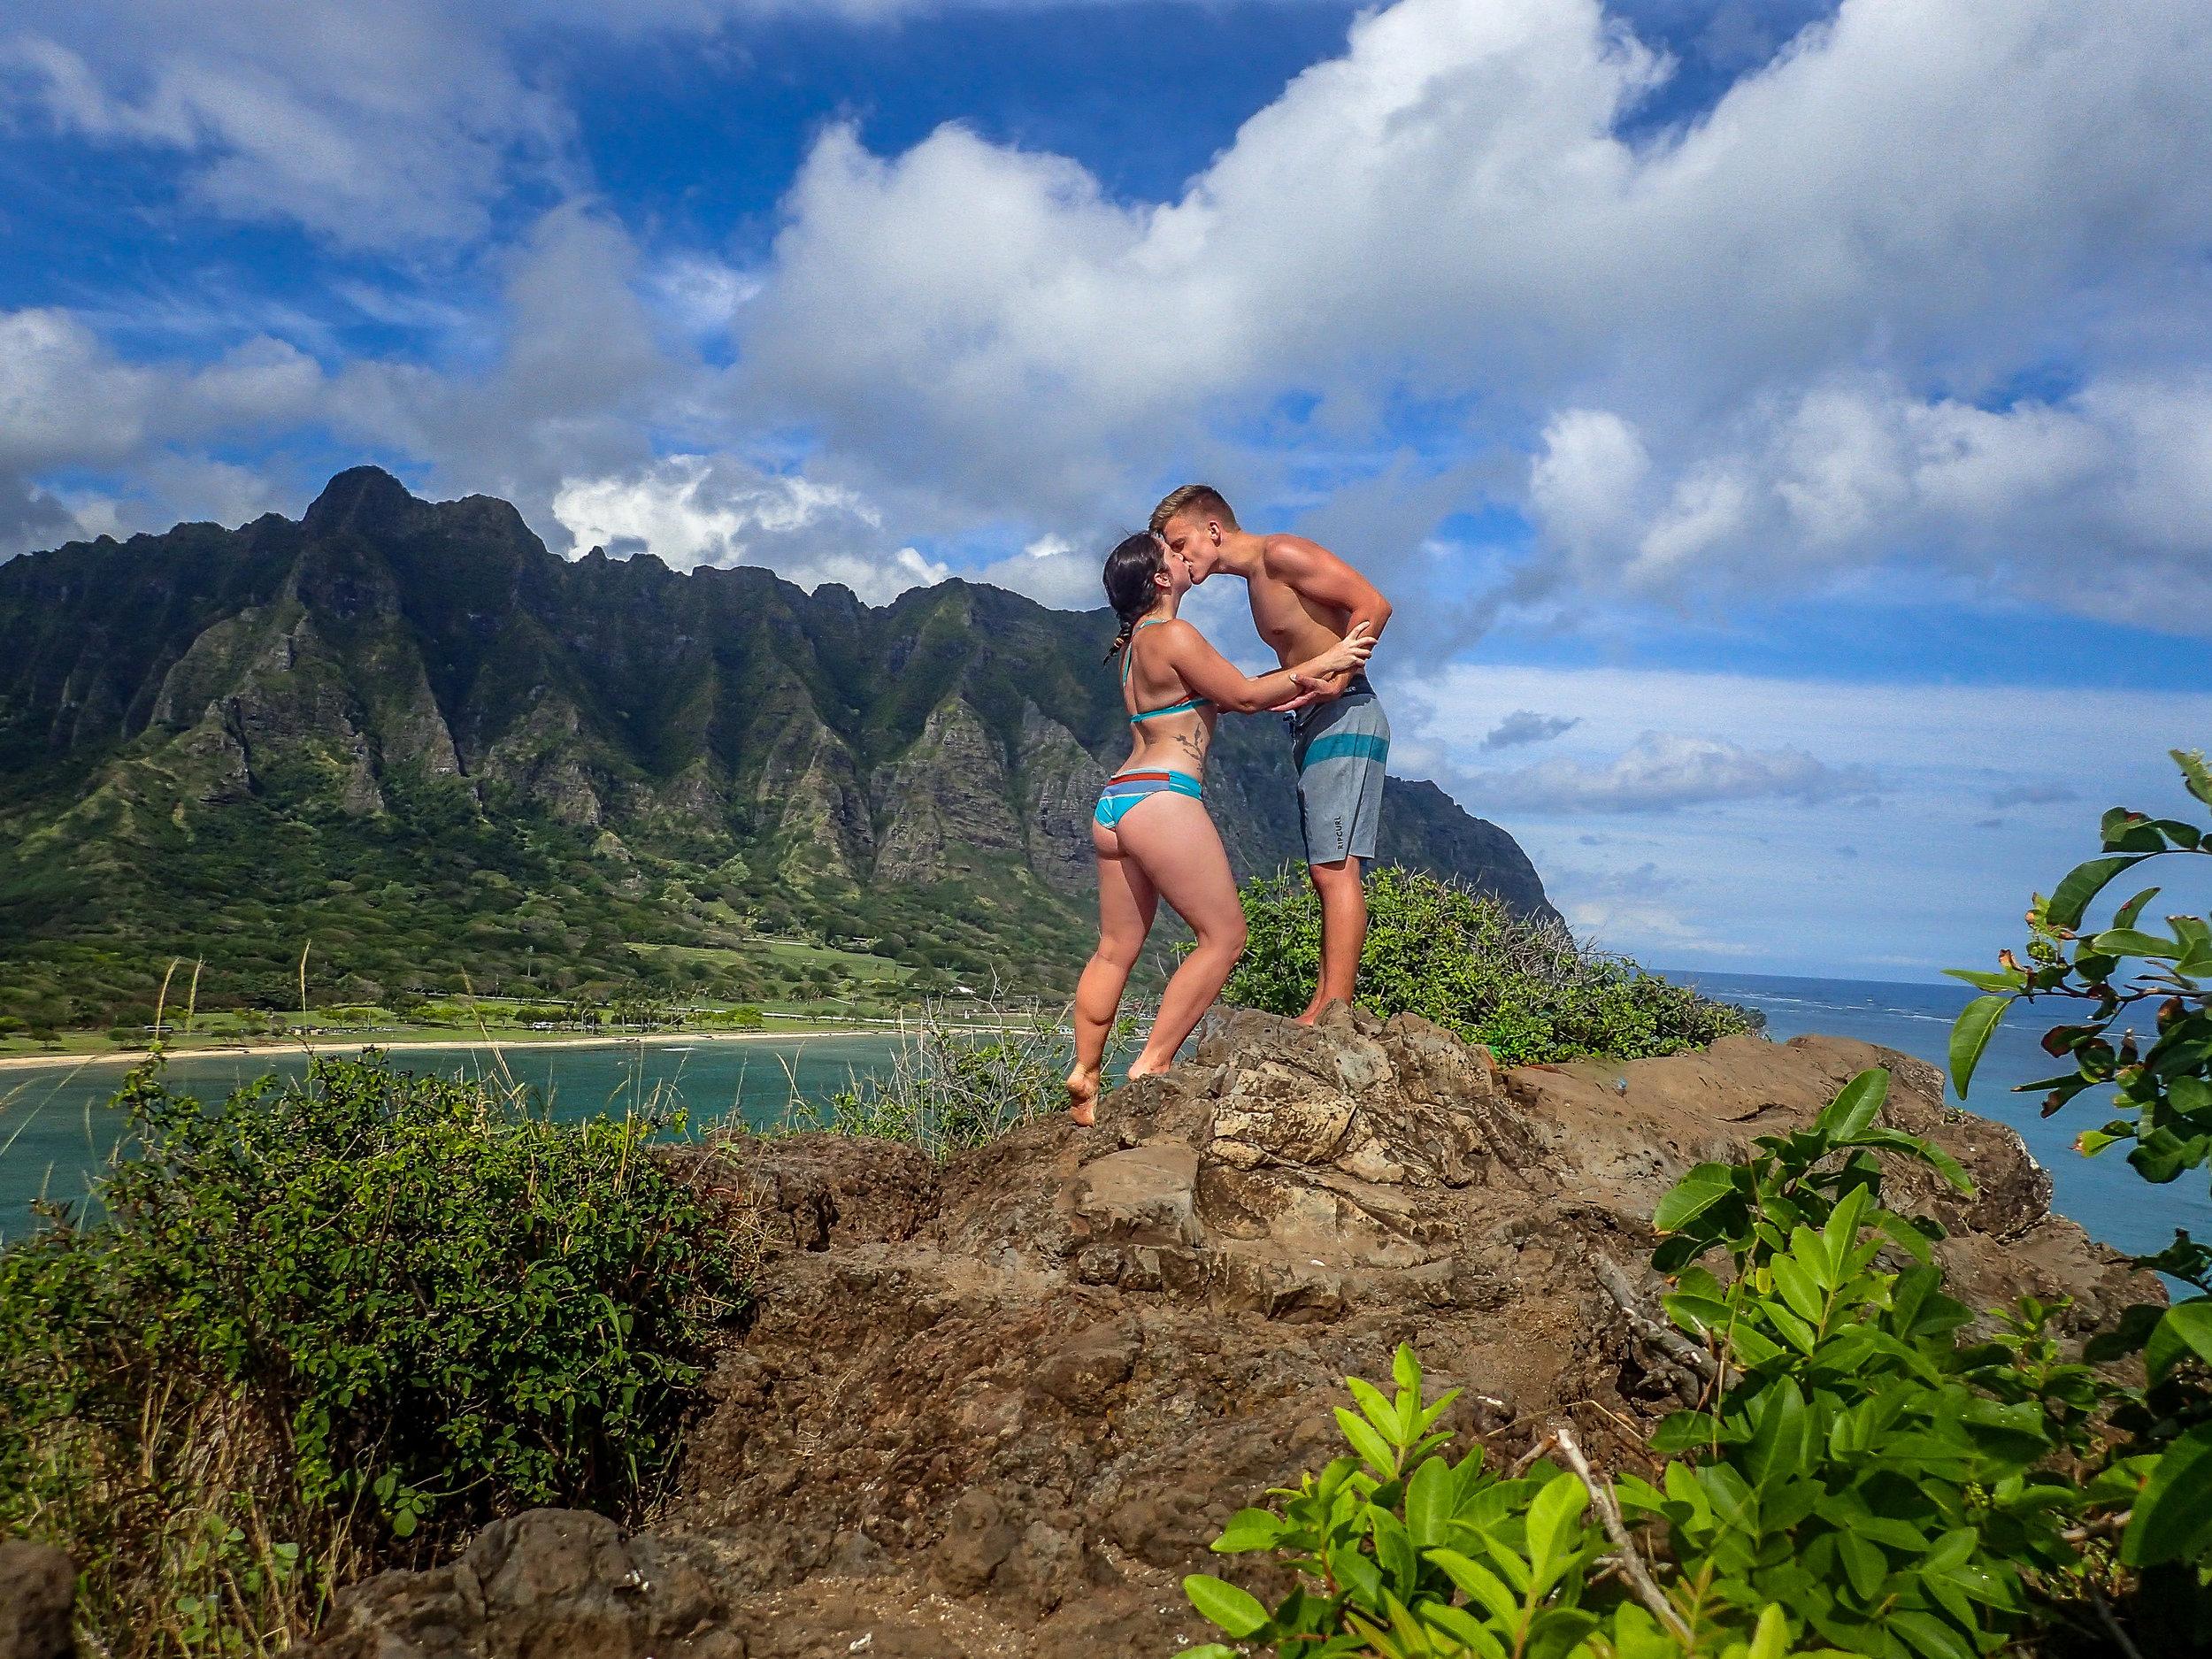 P_Tr_HI_Oahu_Olympus Images-349.jpg